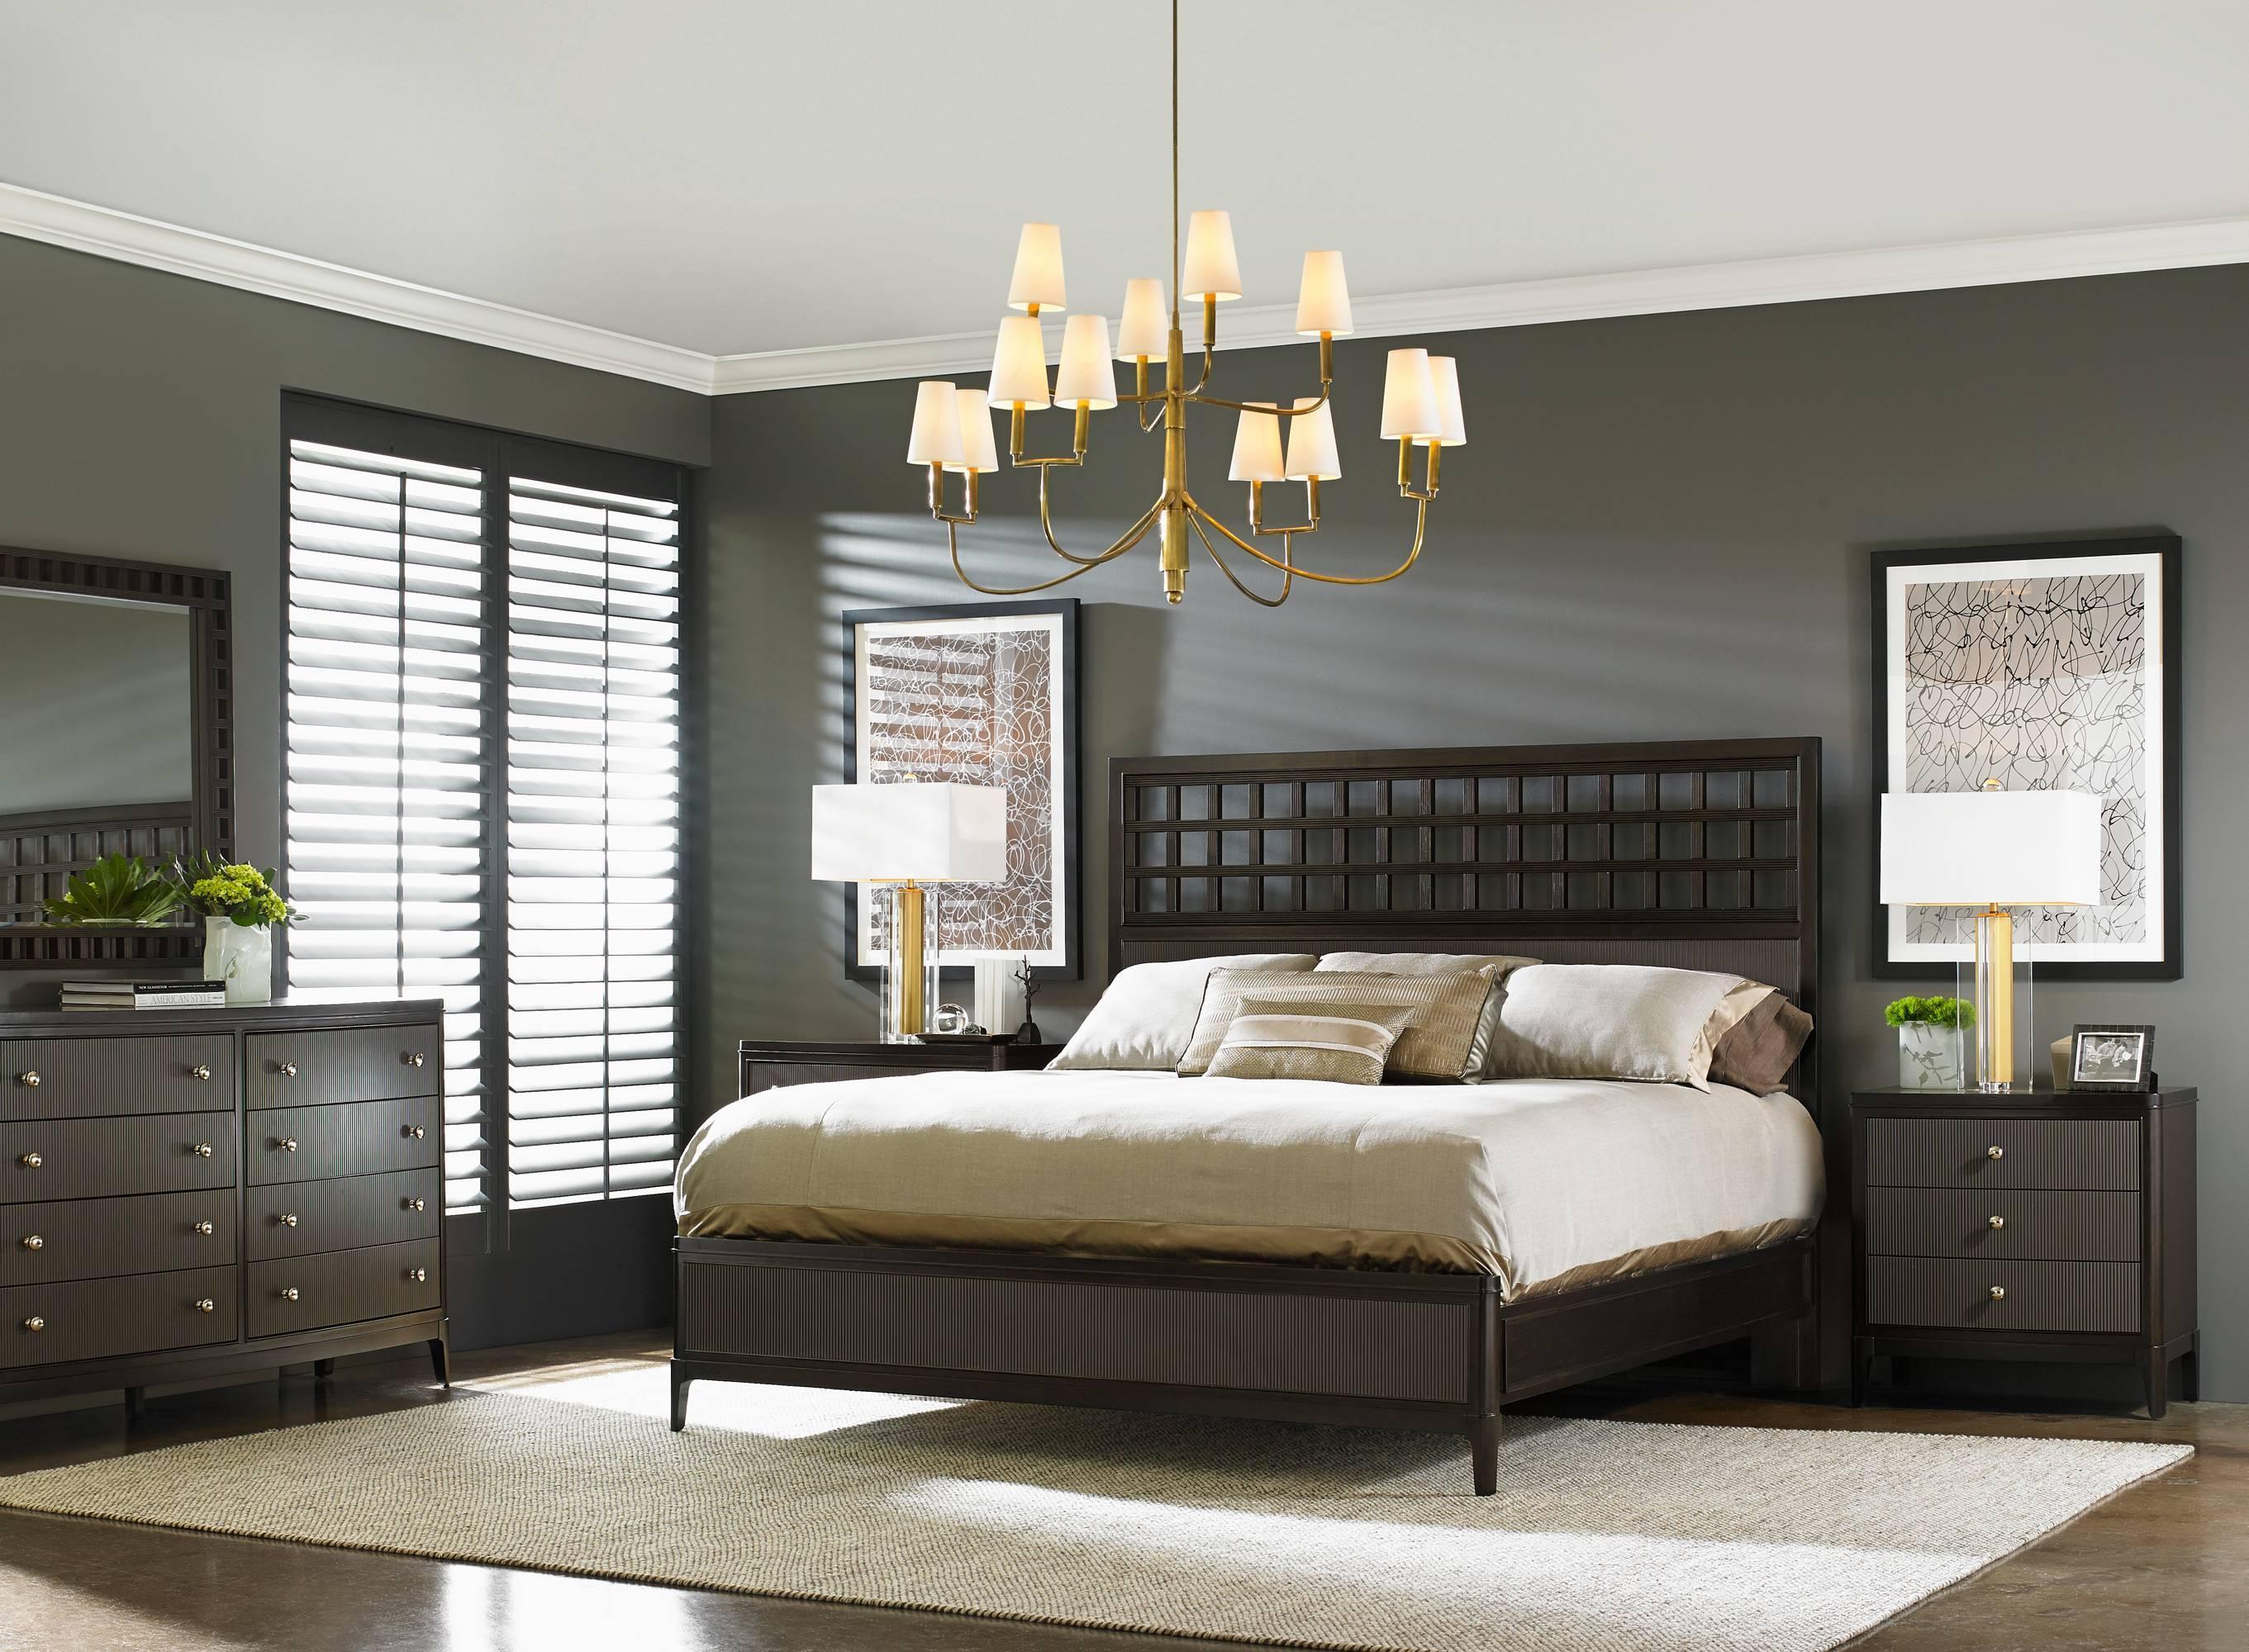 Stanley Furniture Wicker Park  King Bedroom Group - Item Number: 409-13 K Bedroom Group 1